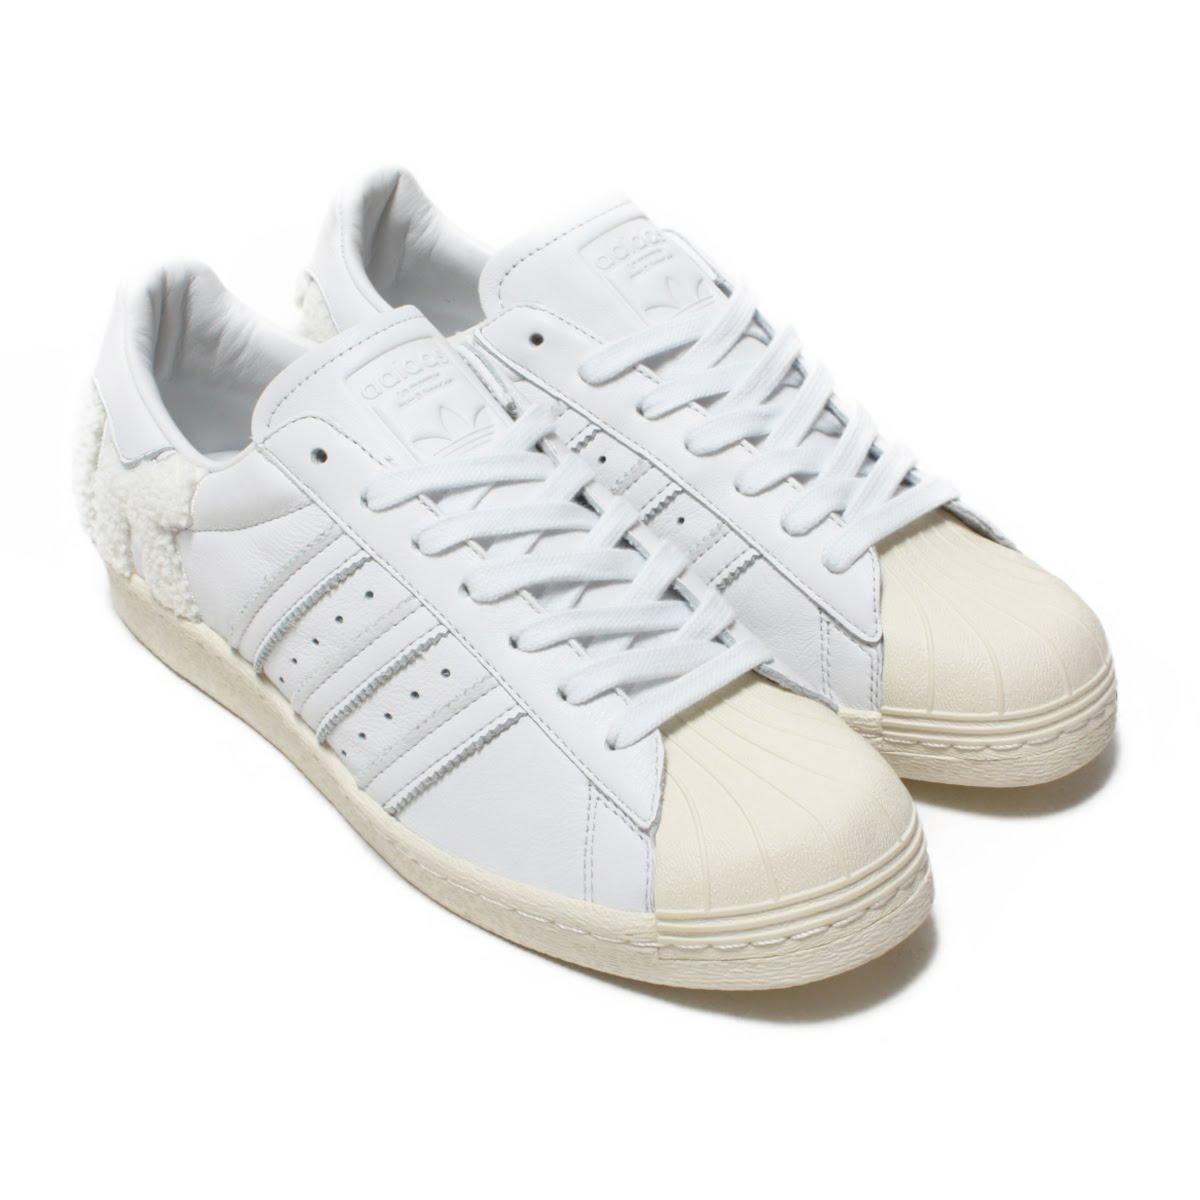 adidas Originals SUPERSTAR 80s(アディダス オリジナルス スーパースター80s)Crystal White/Crystal White/Off White【メンズ レディース スニーカー】18FW-I